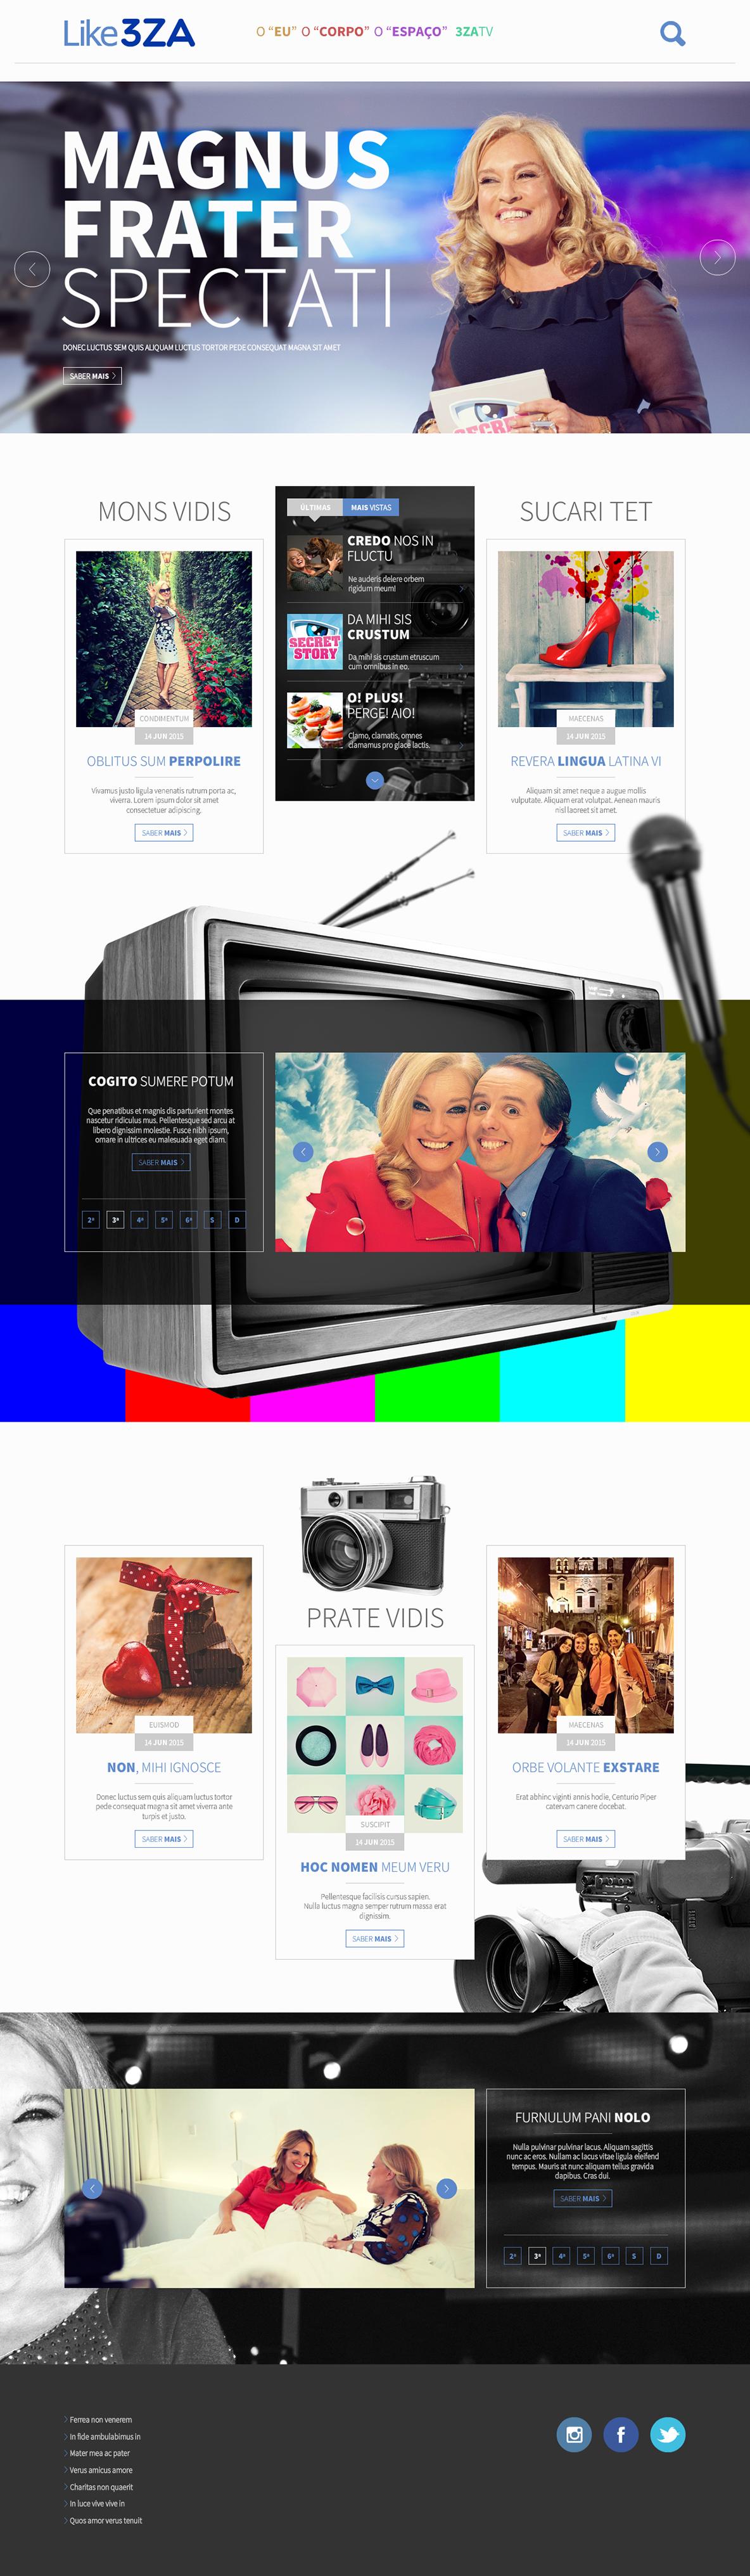 W_Web_LIKE3ZAwebsite0101HOMEPAGEstudy.png